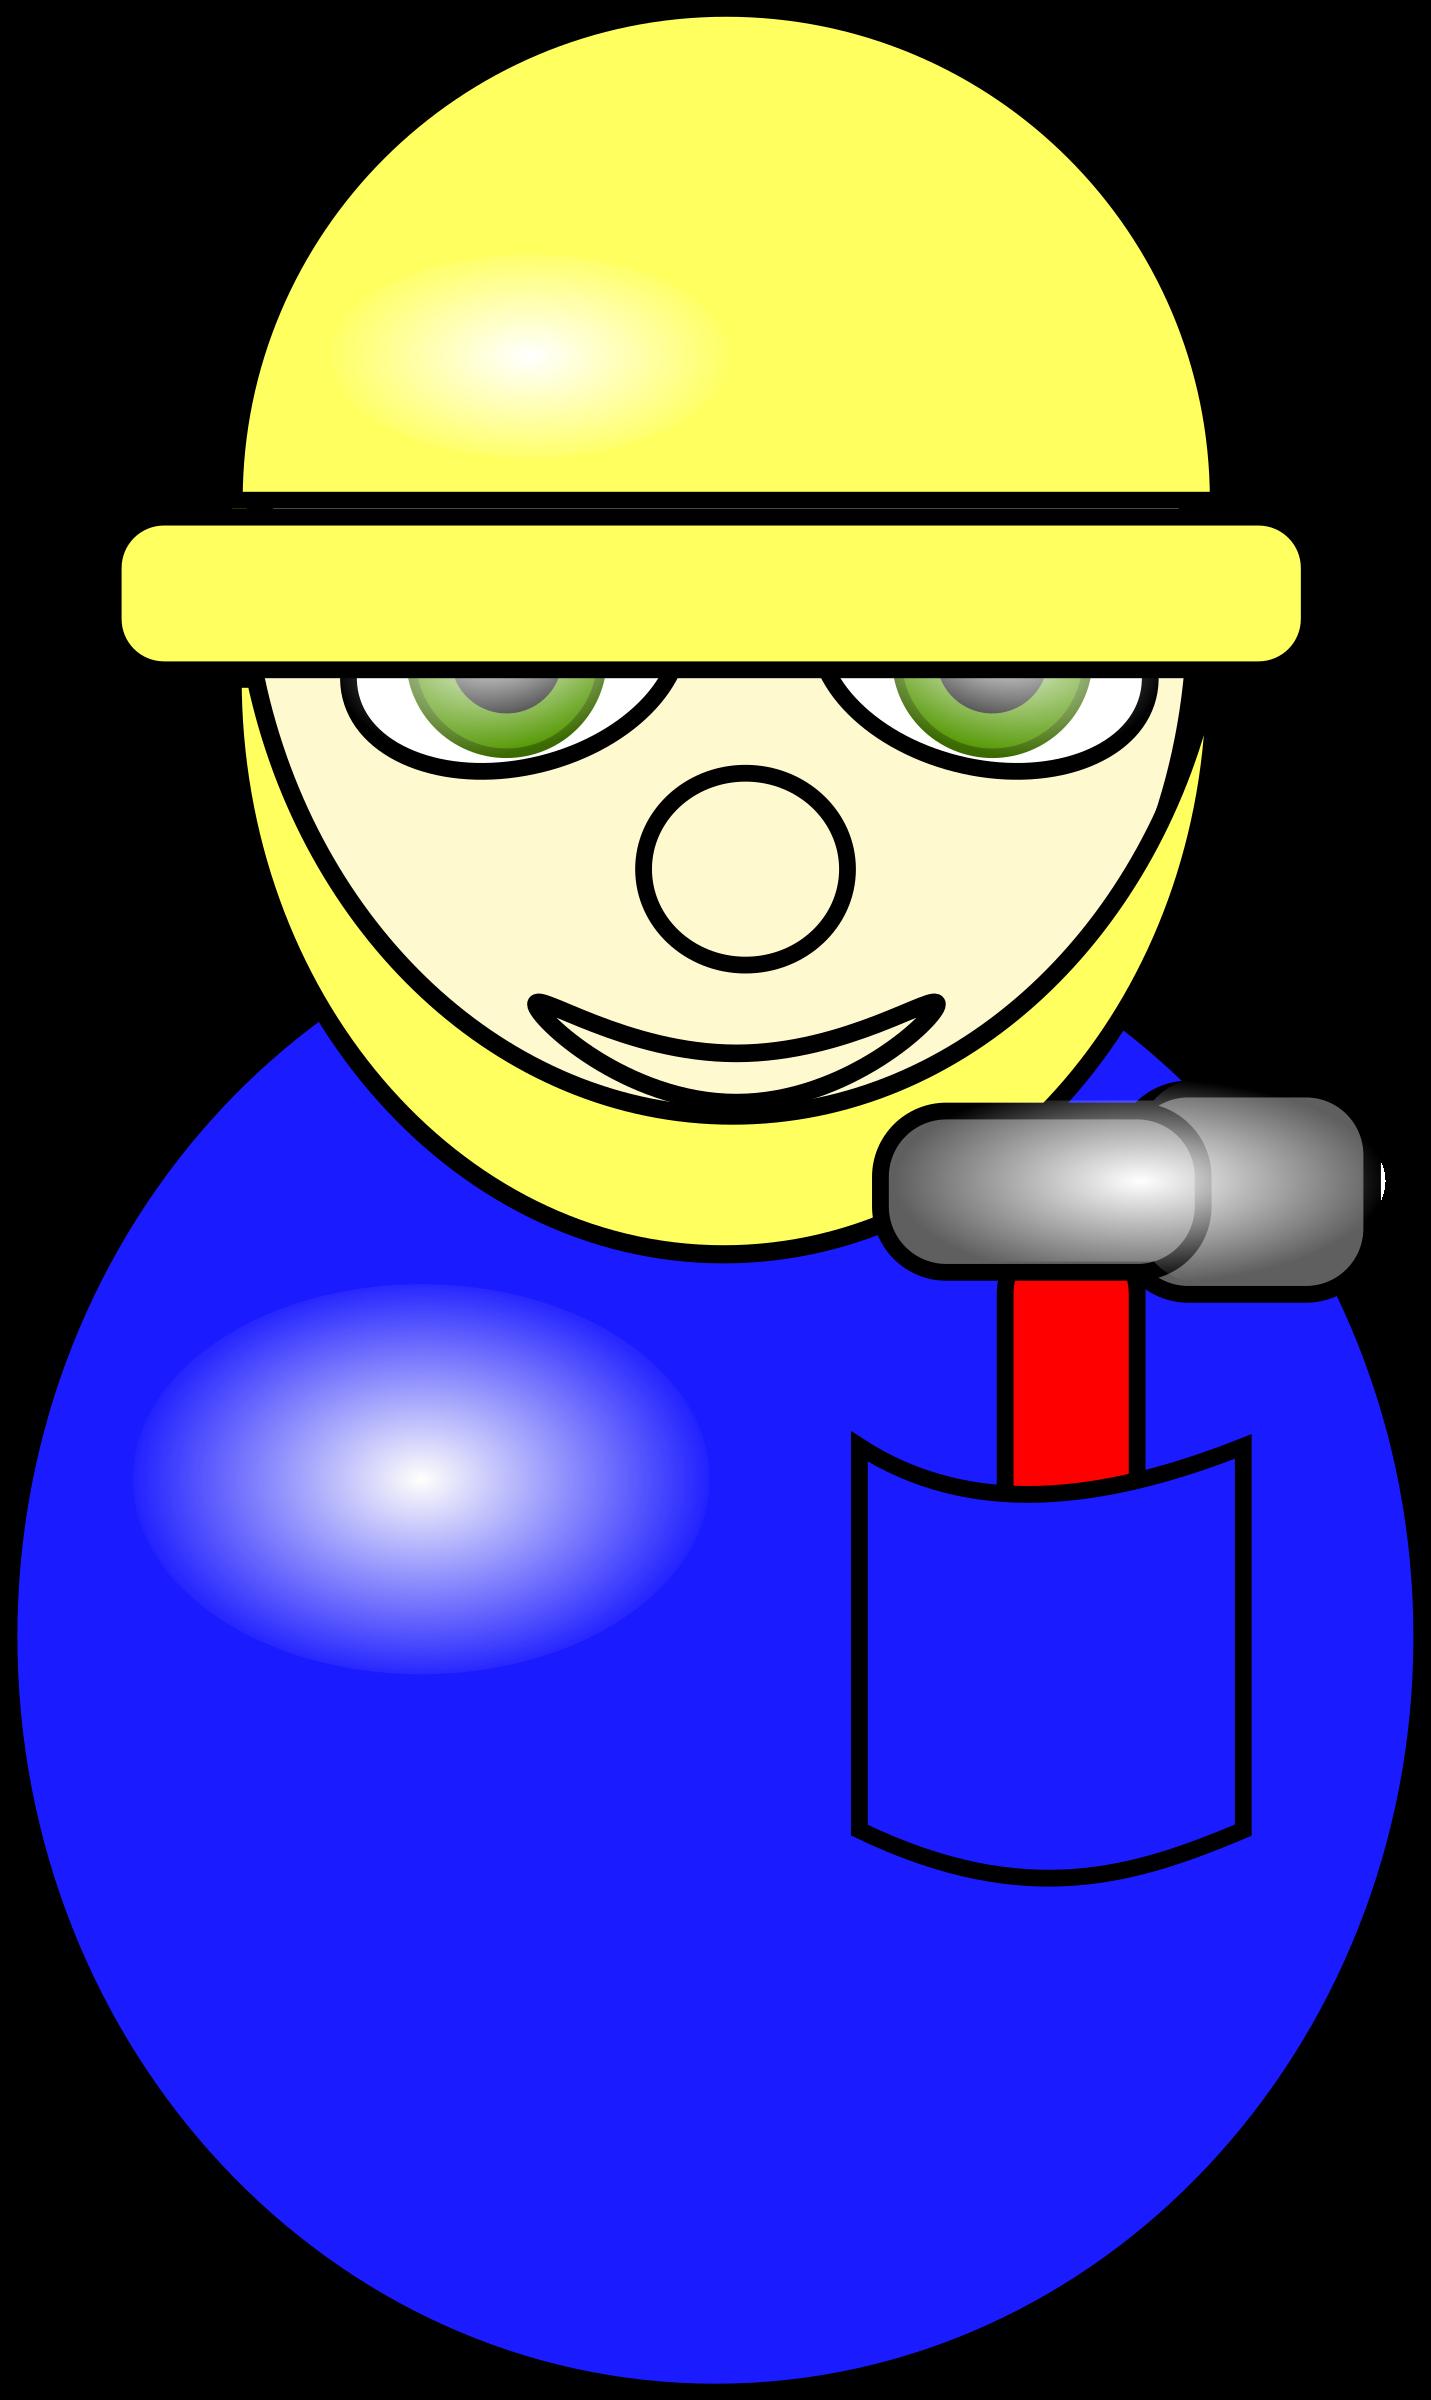 Contractor clipart project coordinator. Construction worker cartoon in